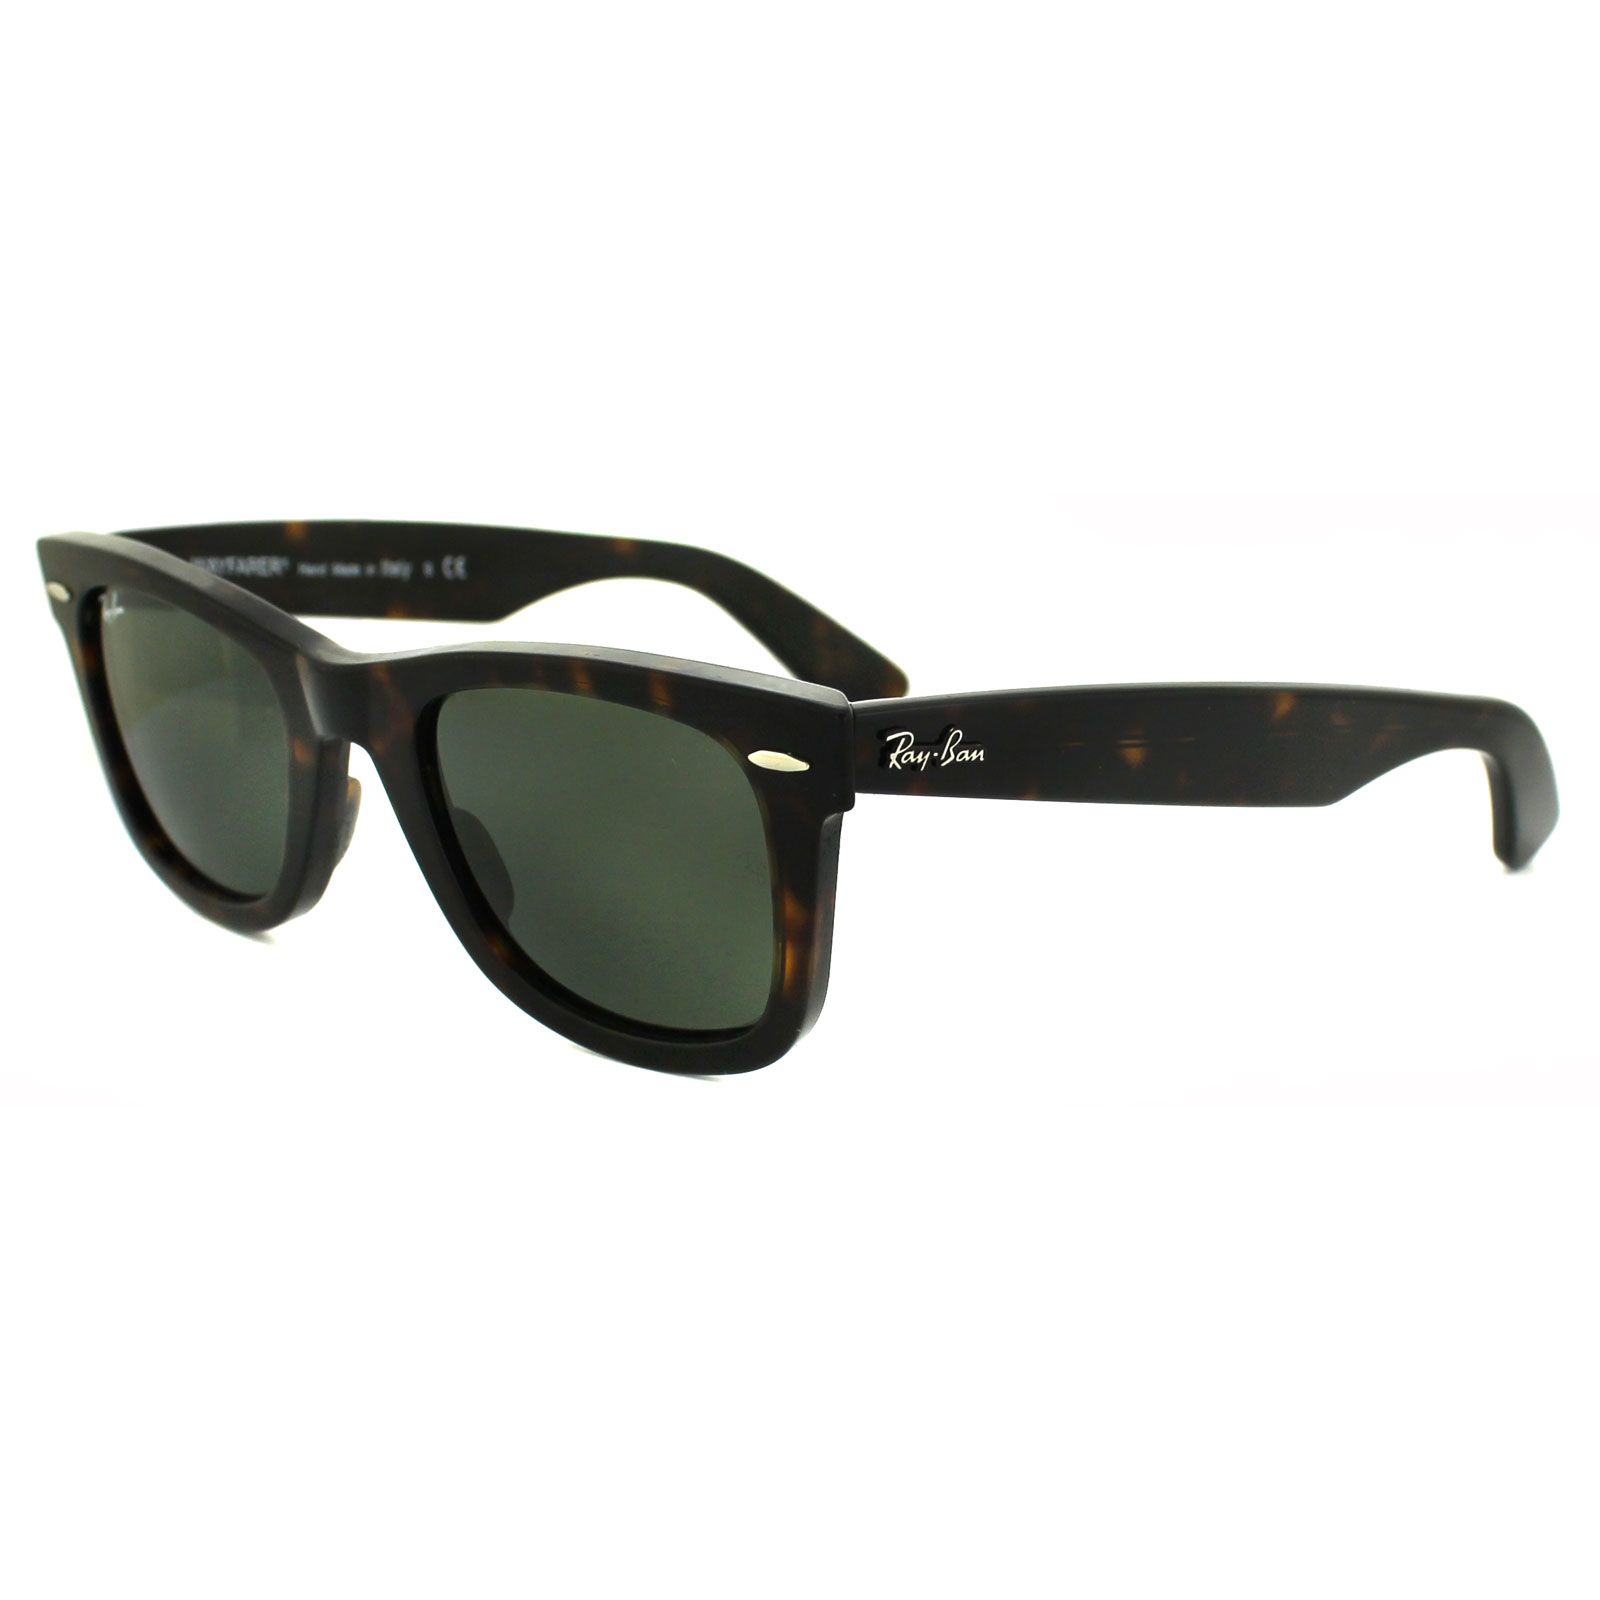 e760178fc37 Ray-Ban Sunglasses Wayfarer 2140 902 Tortoise Green G-15 Small 47mm  Thumbnail 1 ...